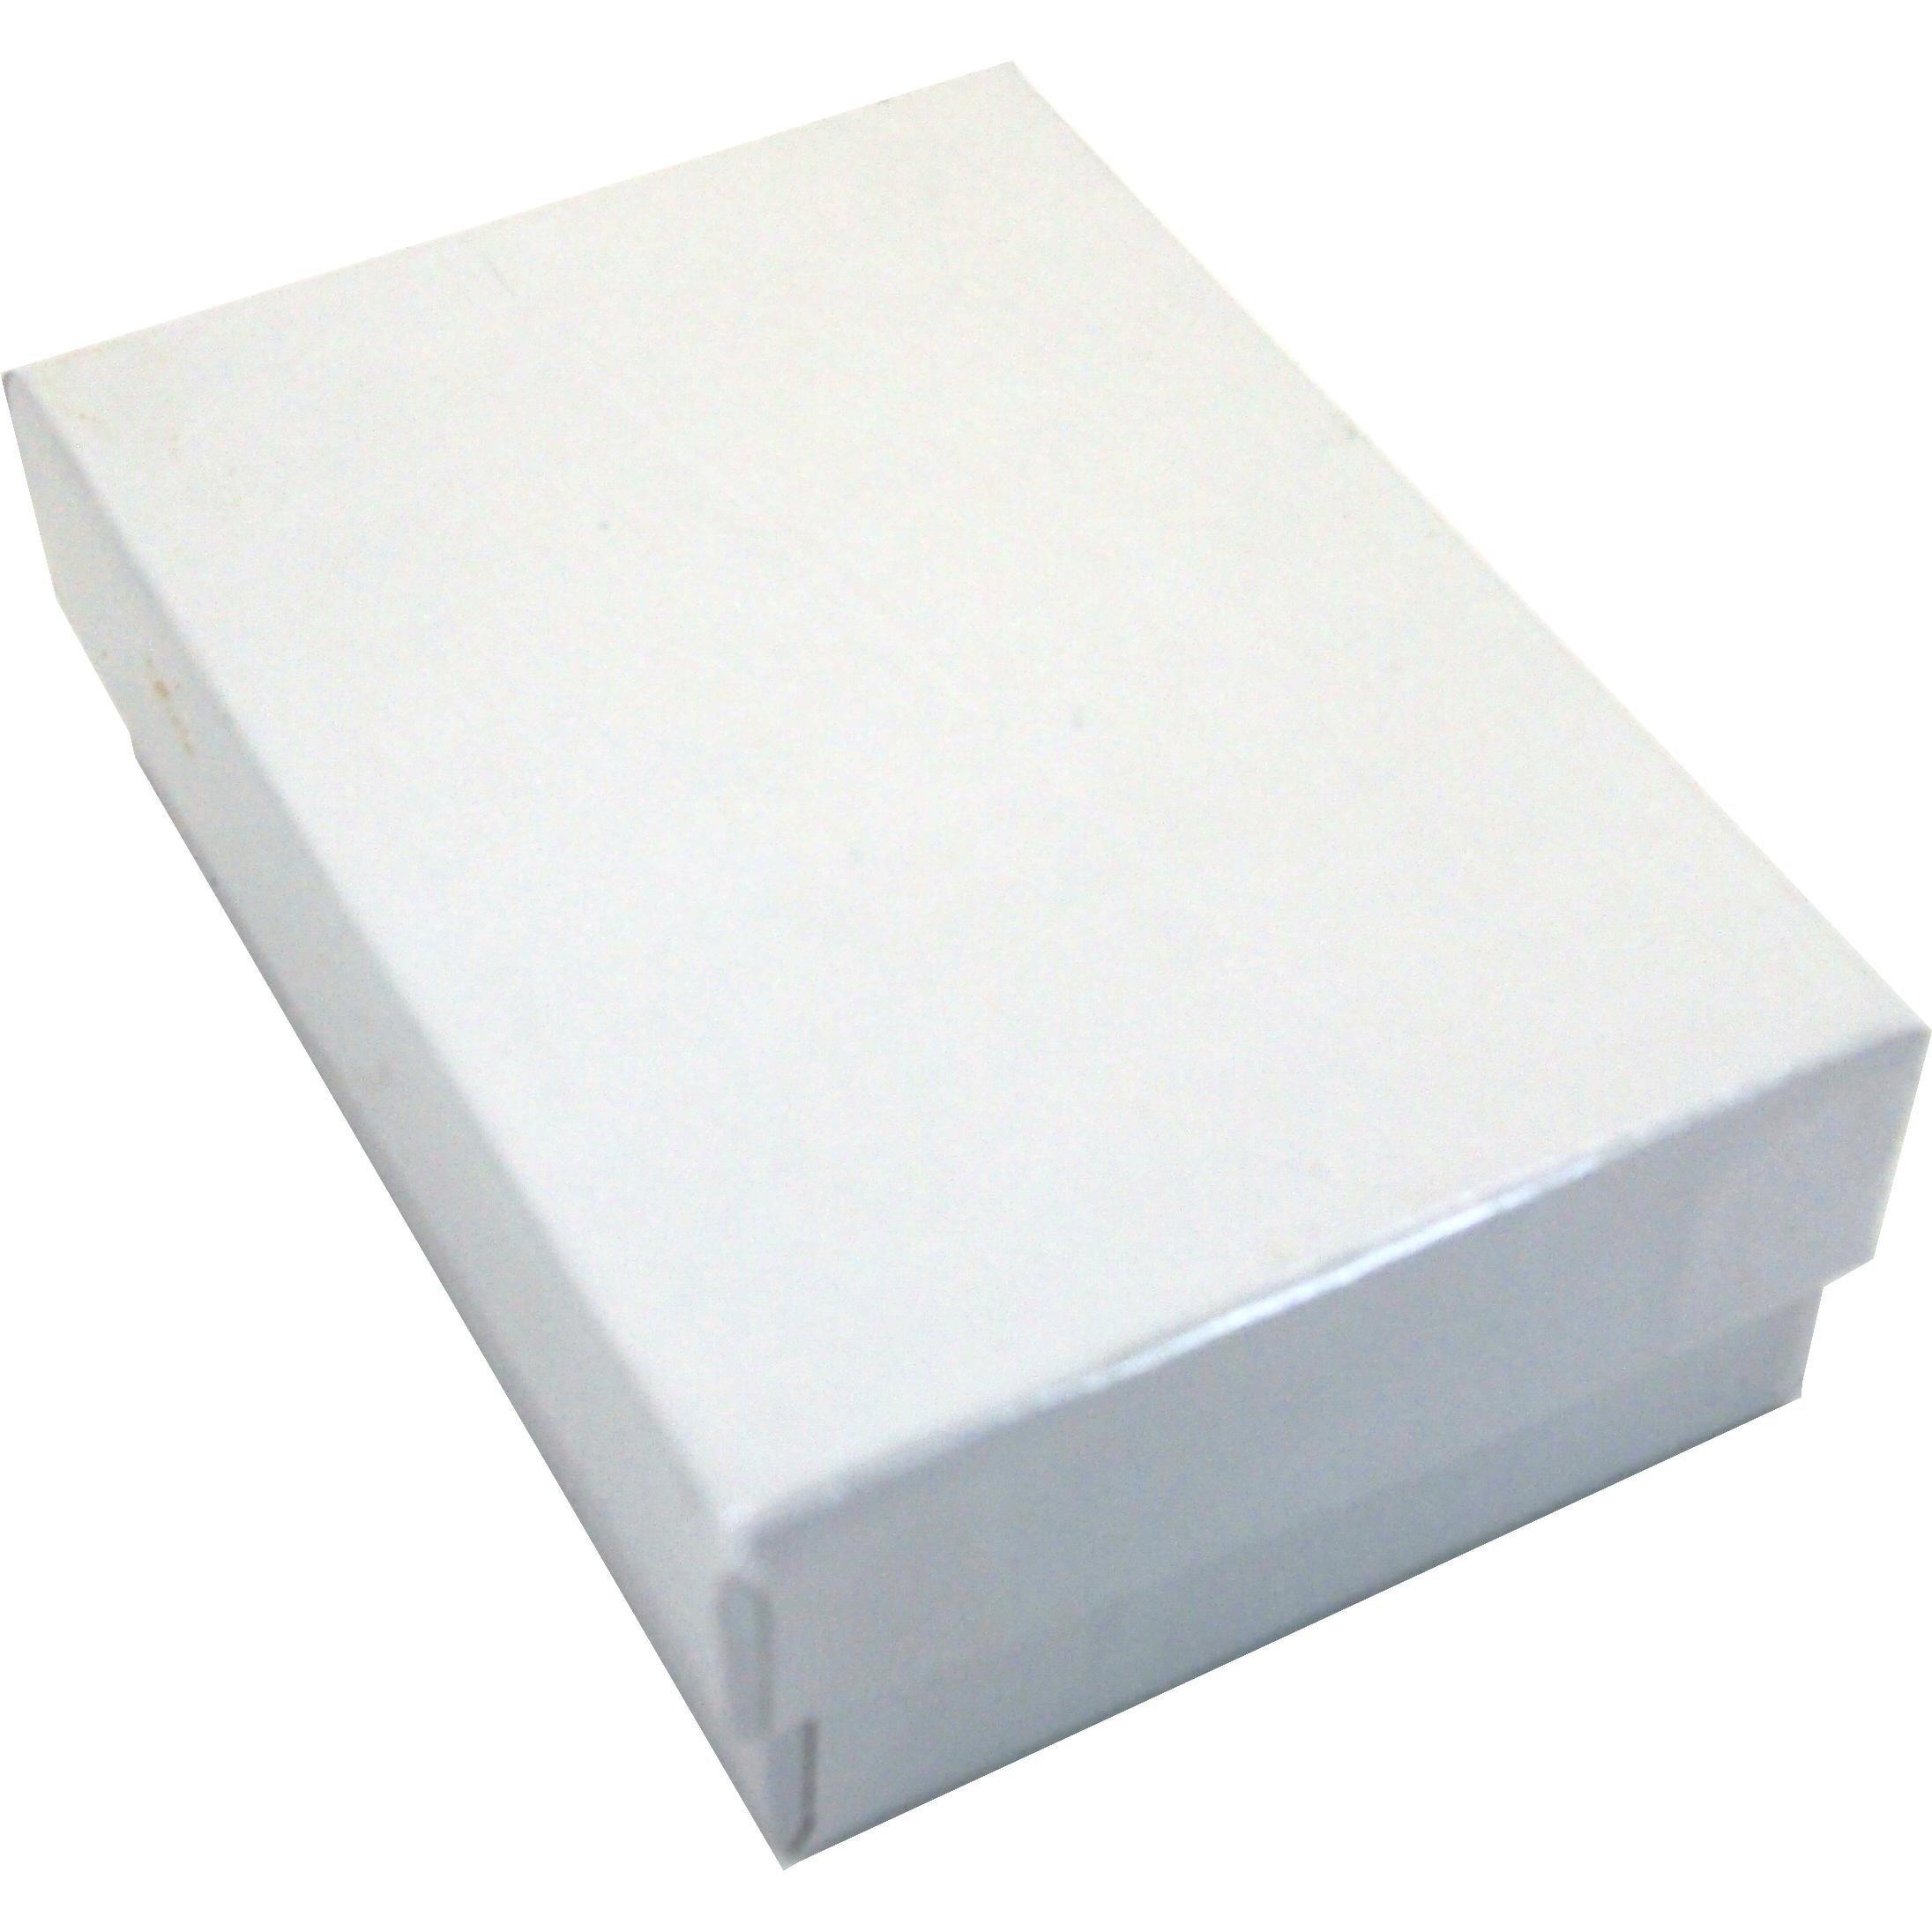 100 Cotton Boxes White Pendant Chain Jewelry Displays 3.25''